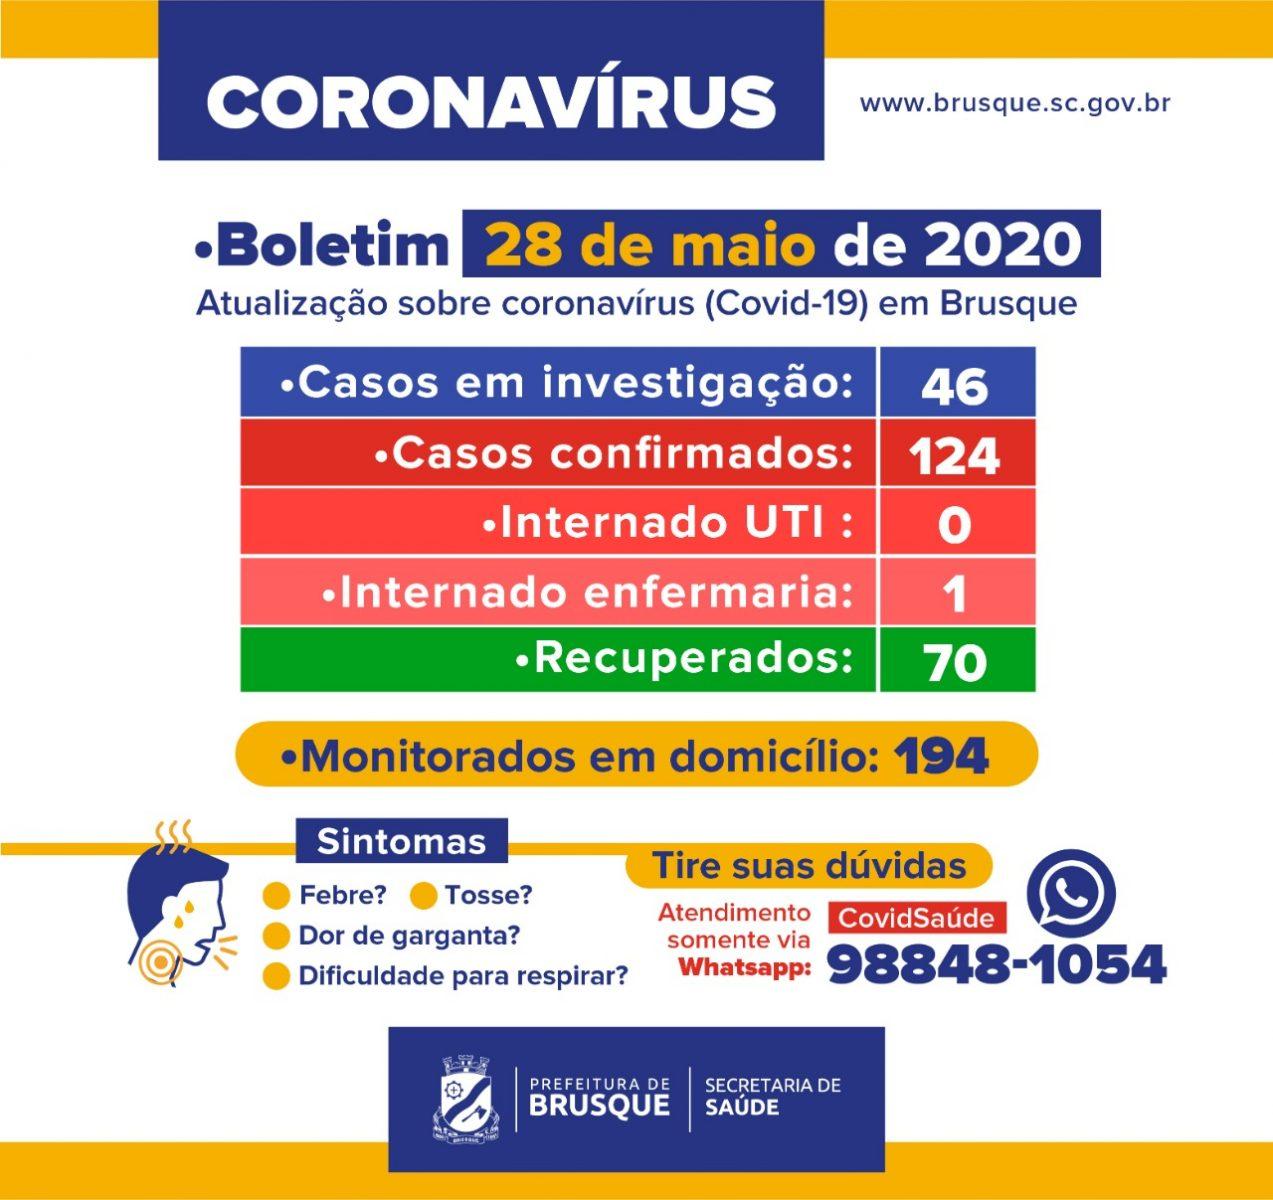 Confira o Boletim Epidemiológico da Prefeitura de Brusque desta quinta-feira (28)